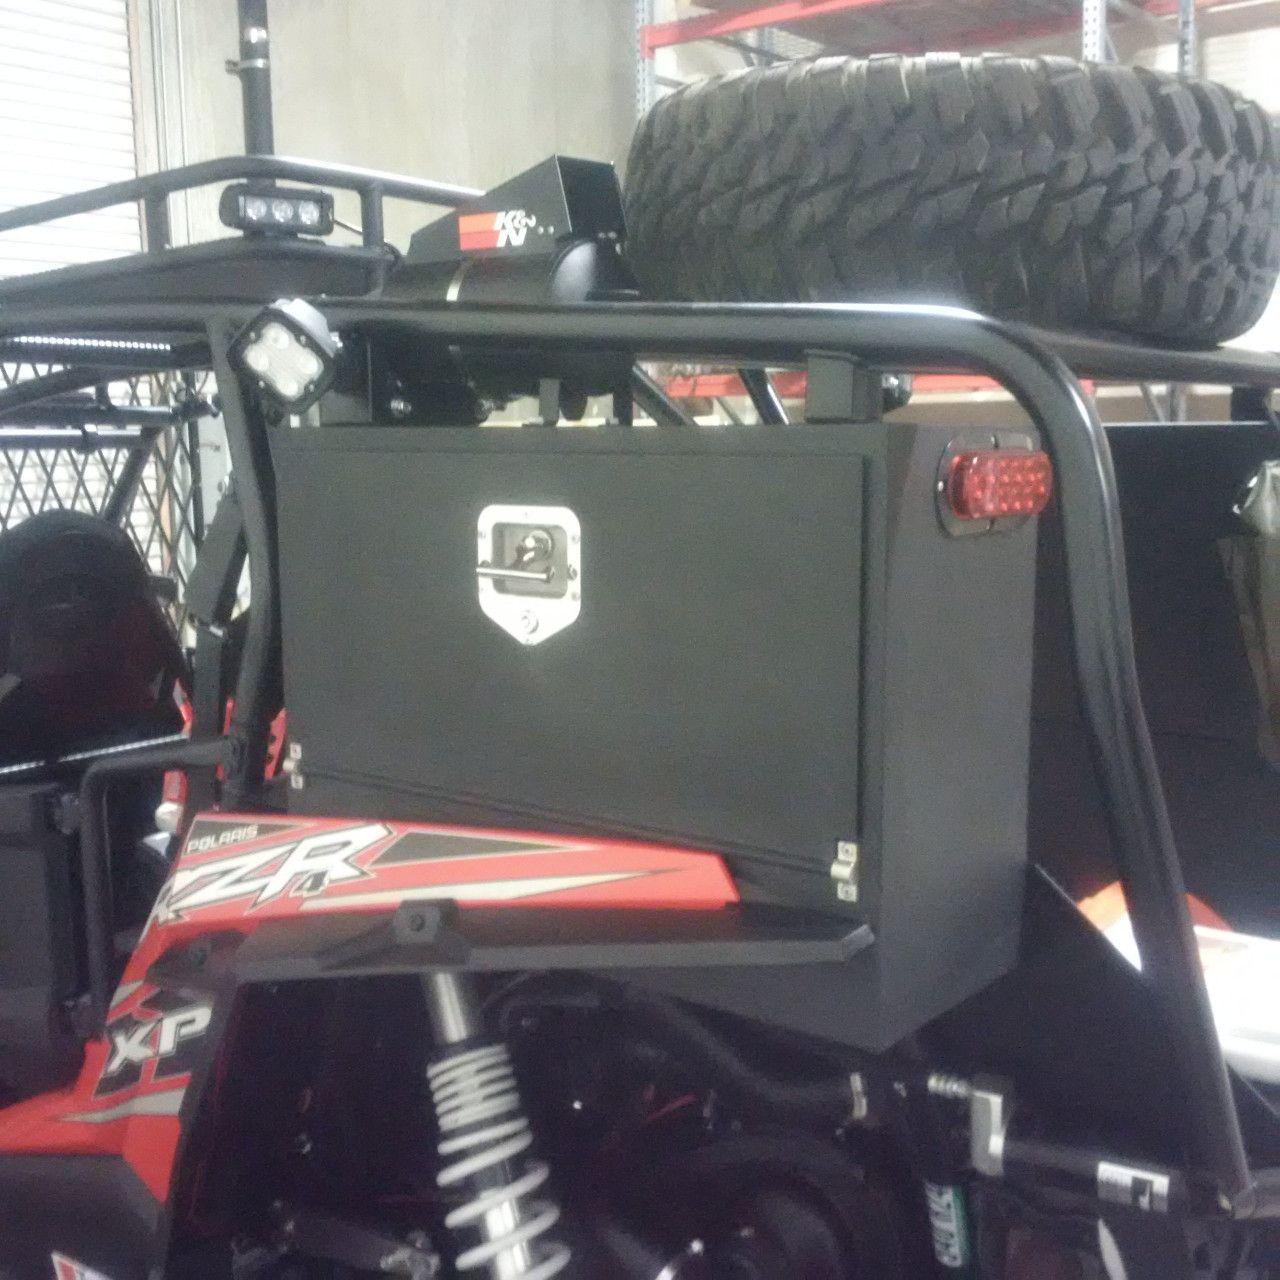 Used 2016 Polaris RZR XP 4 1000 EPS ATVs For Sale in